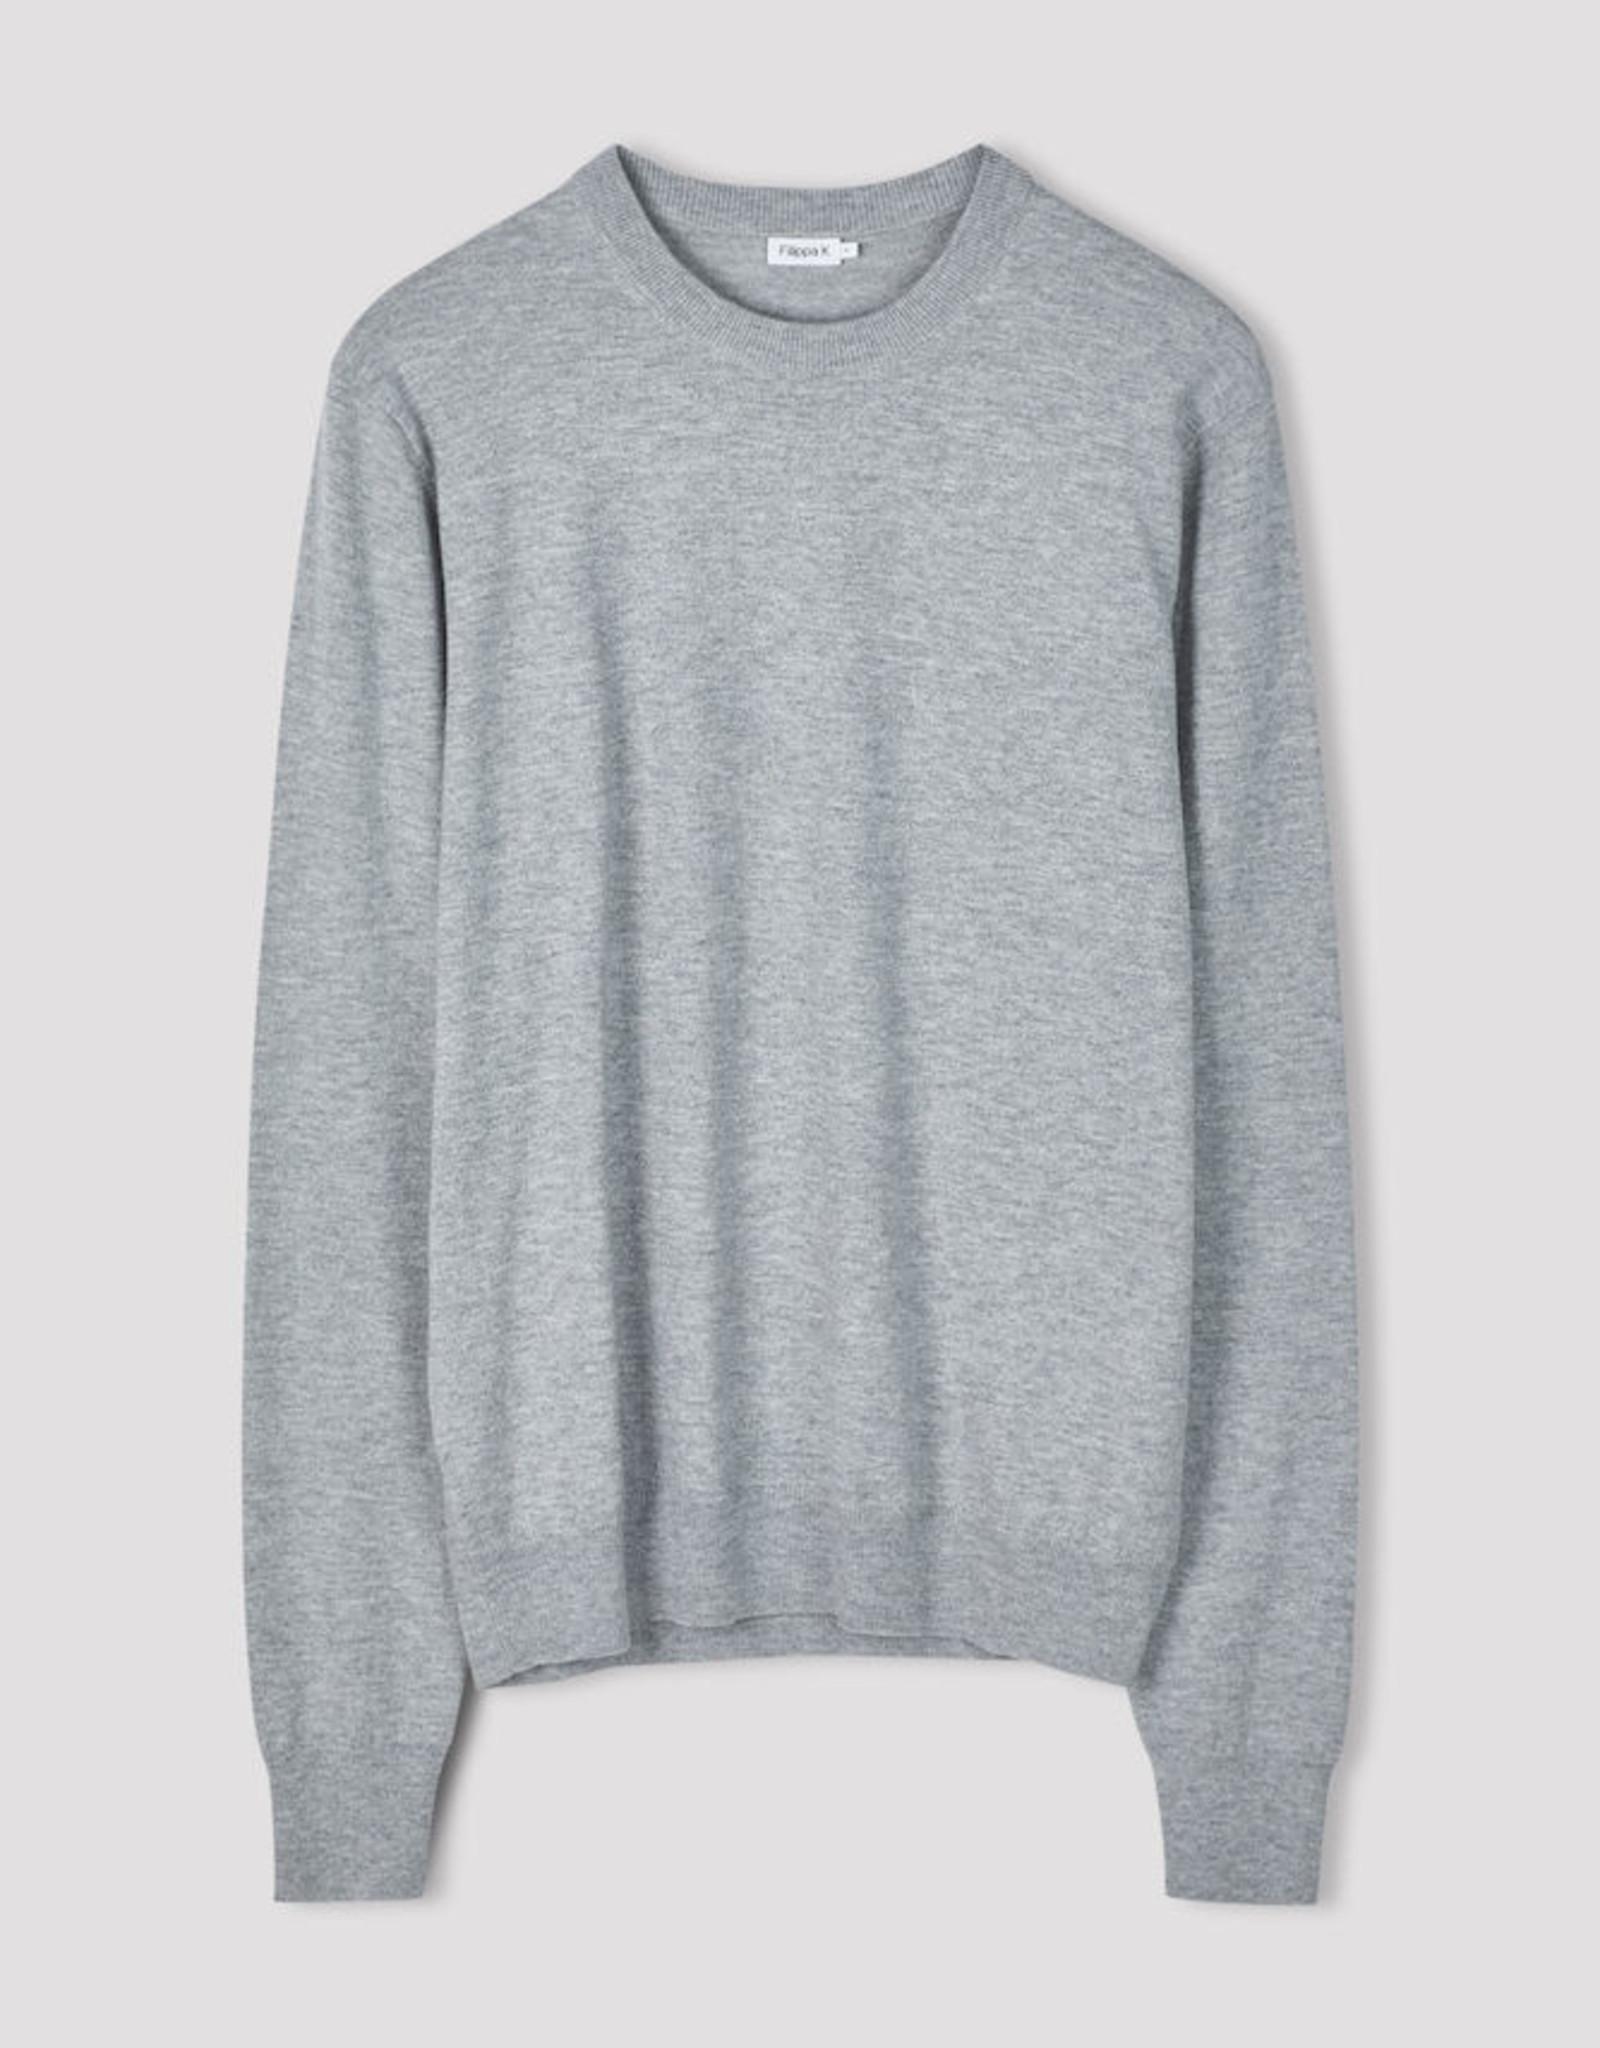 Filippa K M. Cotton Merino Sweater Light Grey